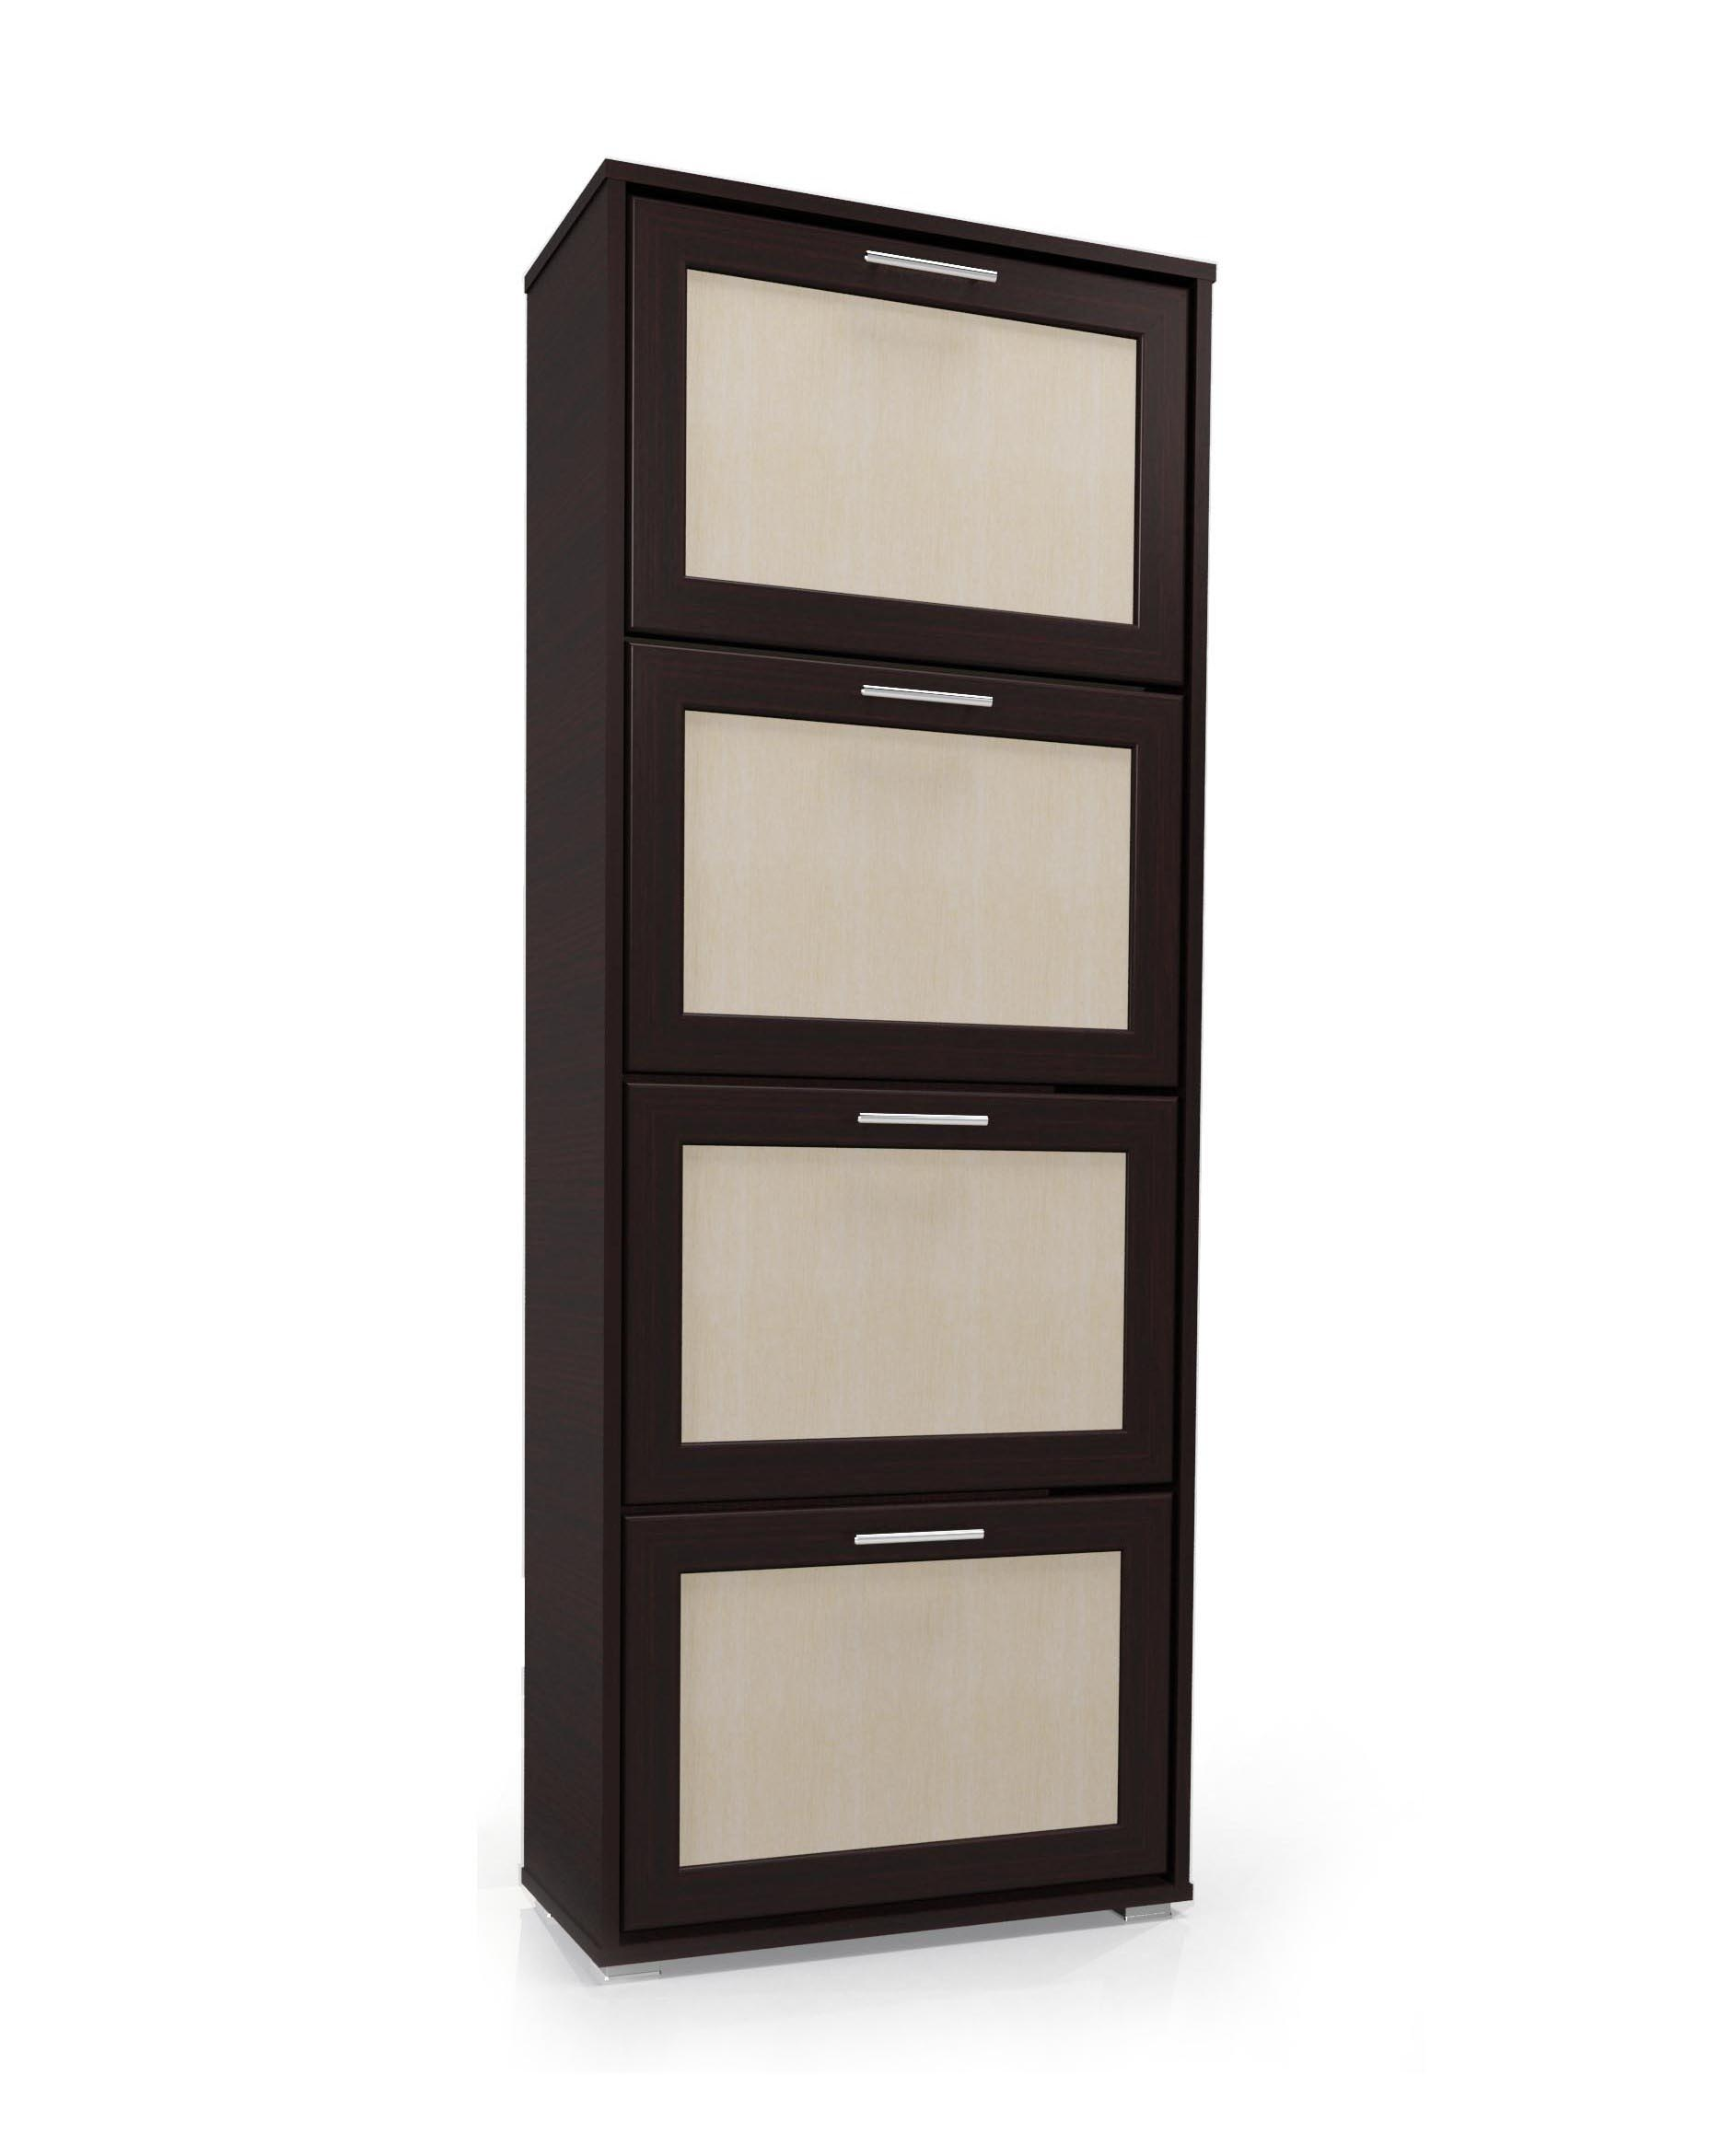 Обувница Мебелайн–13 библиотека мебелайн 4